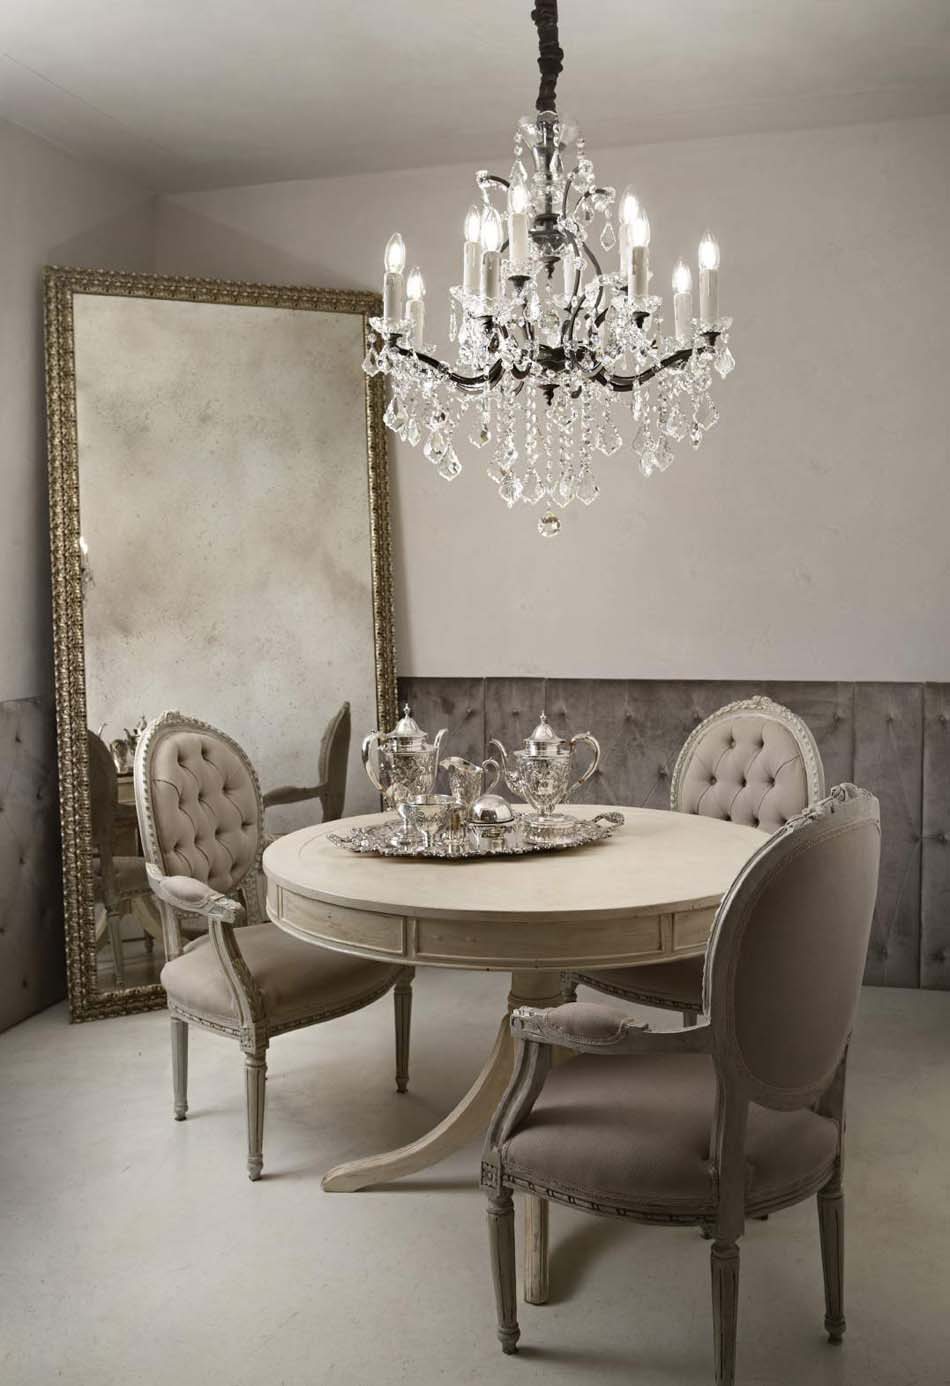 Lampade 28 sospese vintage Ideal Lux liberty – Toscana Arredamenti